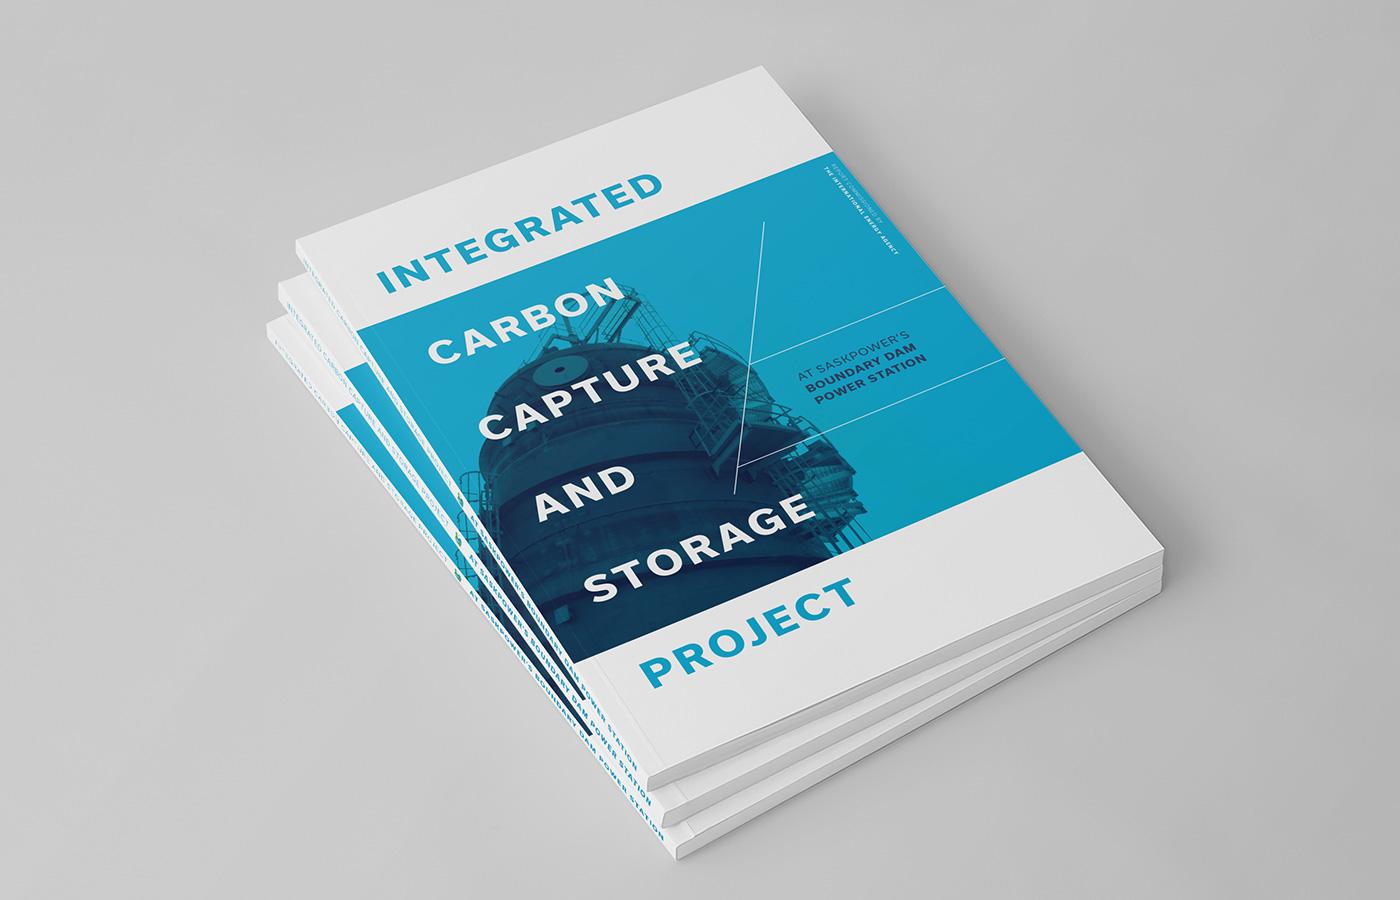 covetdesign_logo-design_branding_brochure-design_graphic-designer_vancouver_print_saskpower1